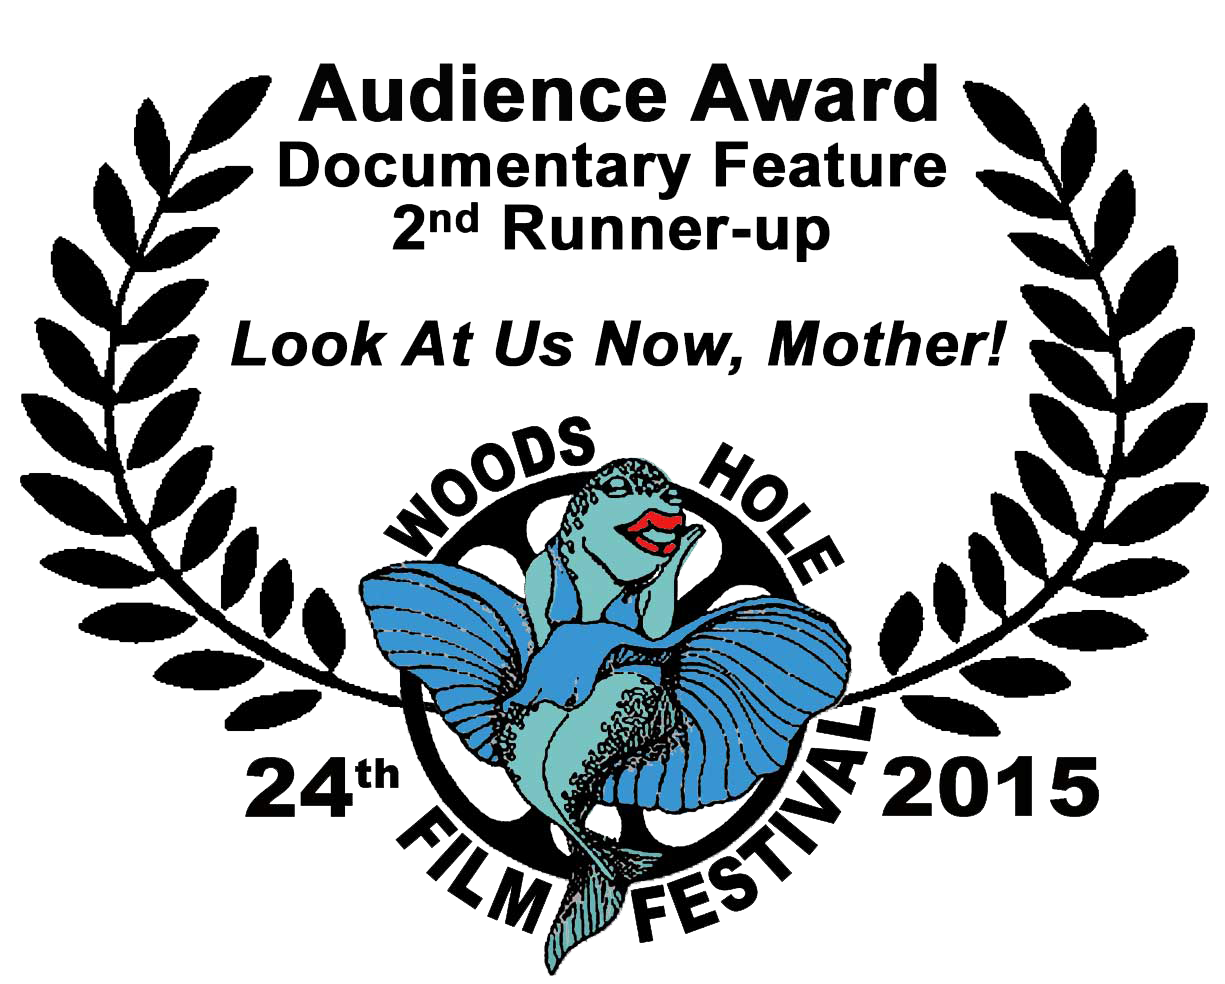 laurels_WHFF2015_AwardsEmblem_Aud_FDoc-2-LAUNMsml